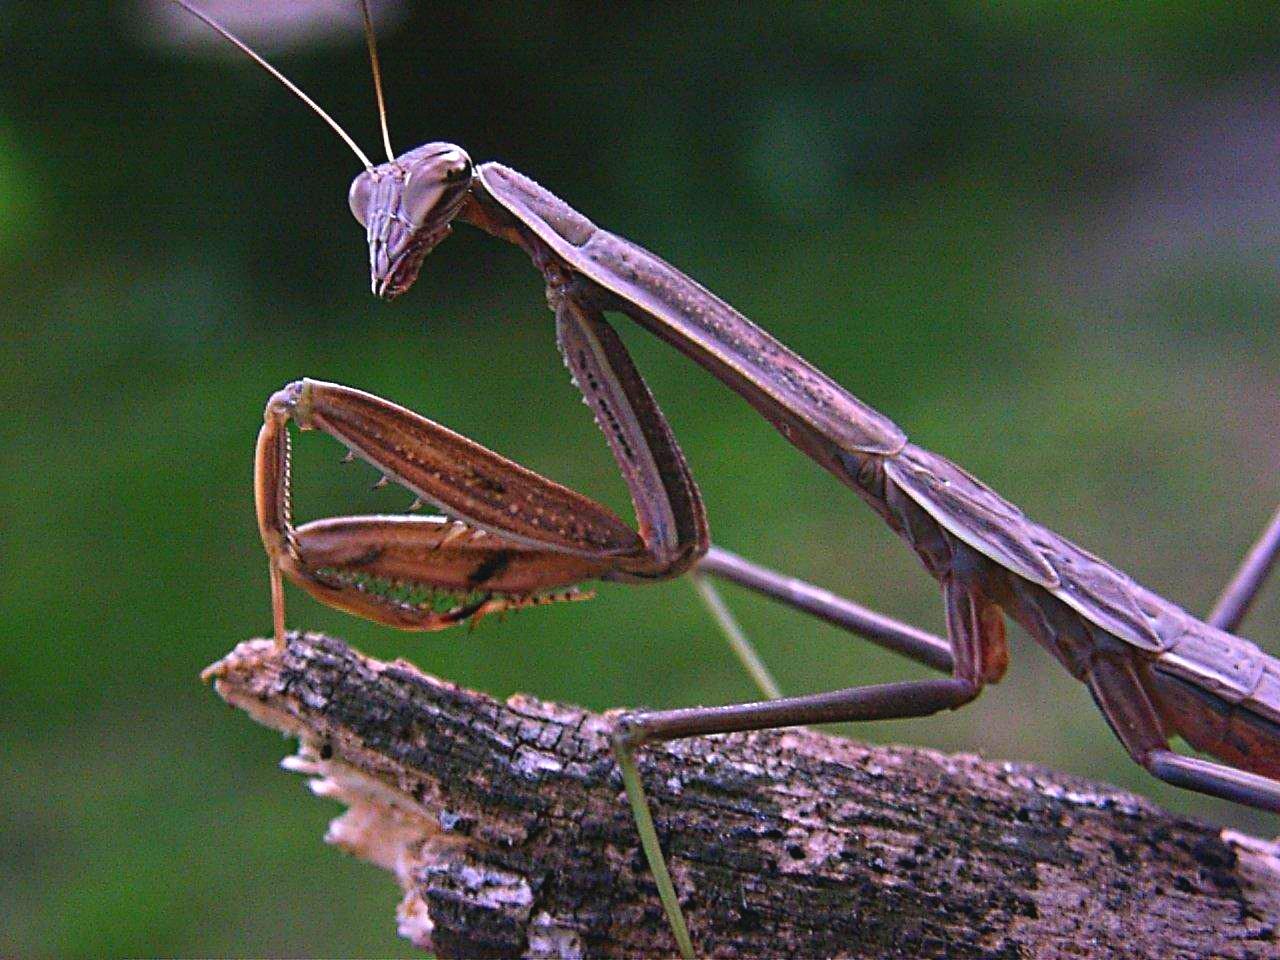 Praying Mantis (at the edge of life... literally) ... by Thomas Peace 2013